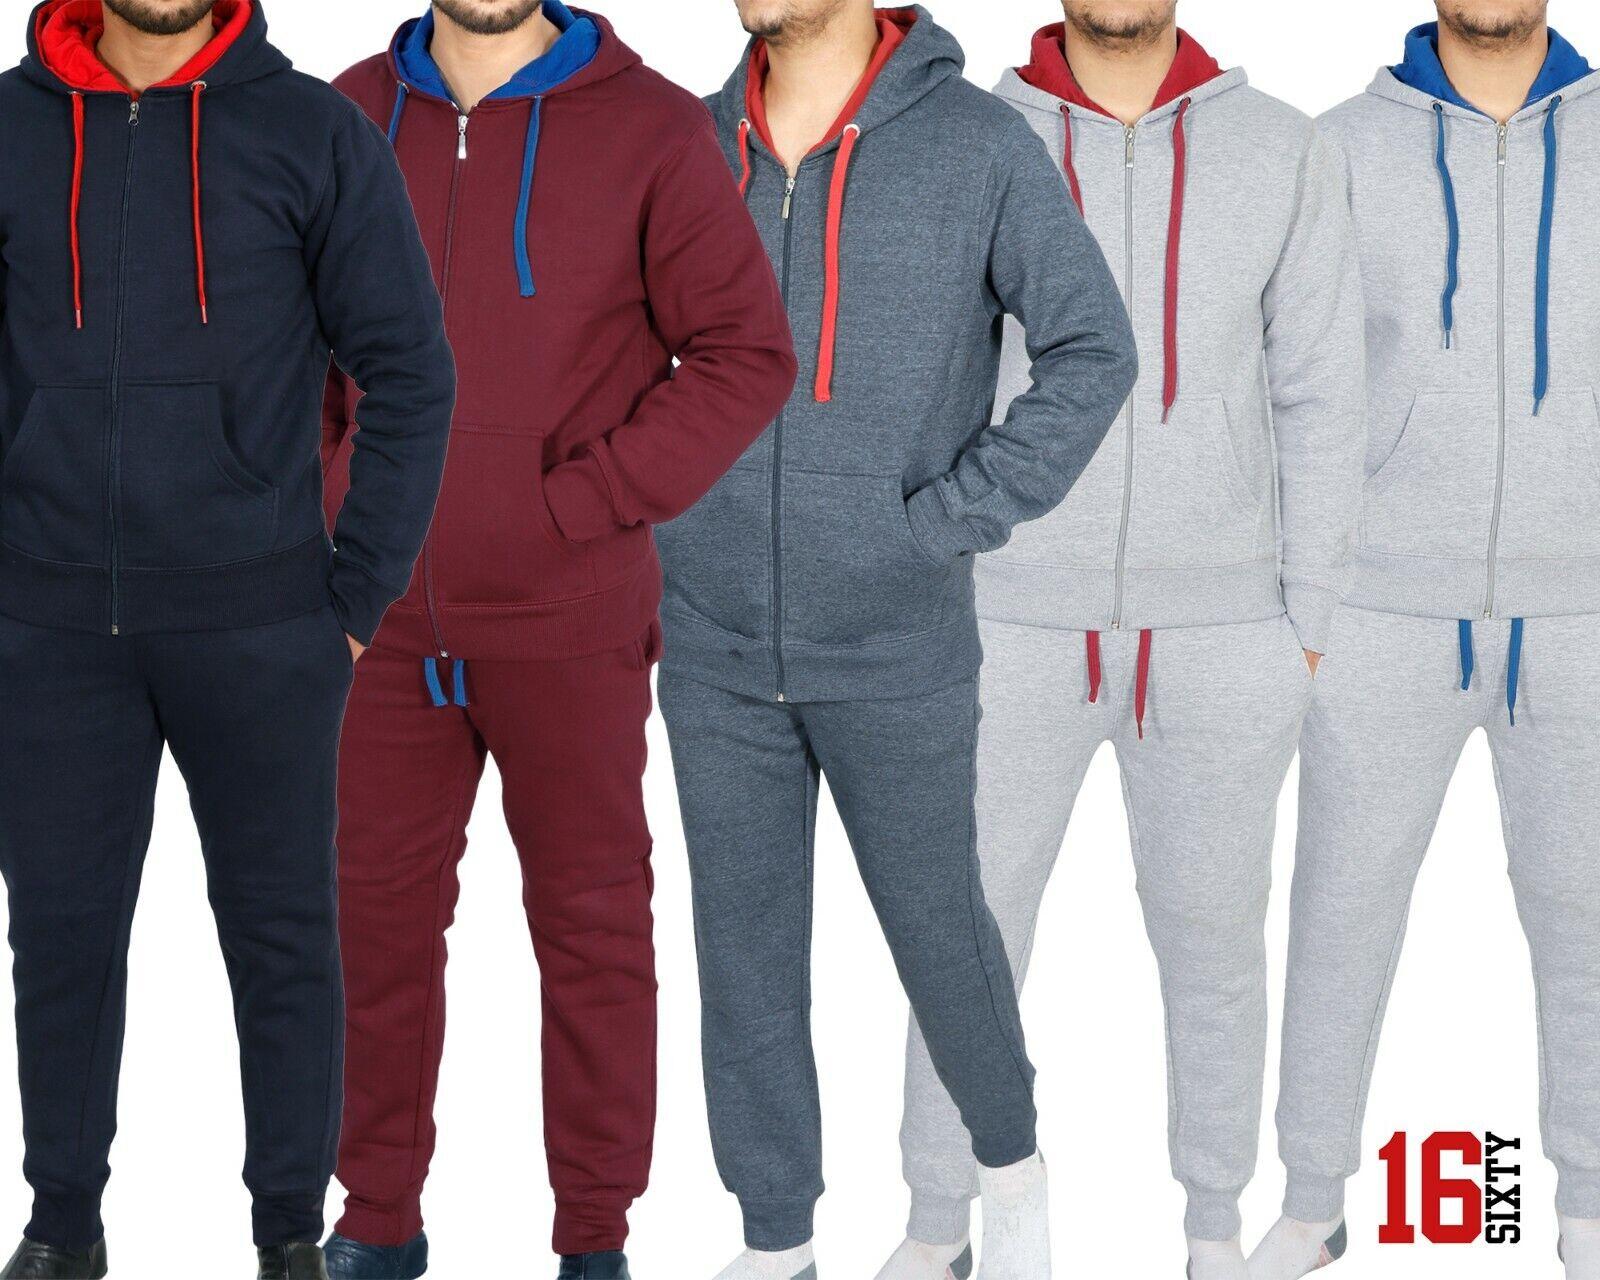 Men's Tracksuit Set Sports Top Bottoms 2 Pcs Gym Cotton Zipper Hoodie Gift